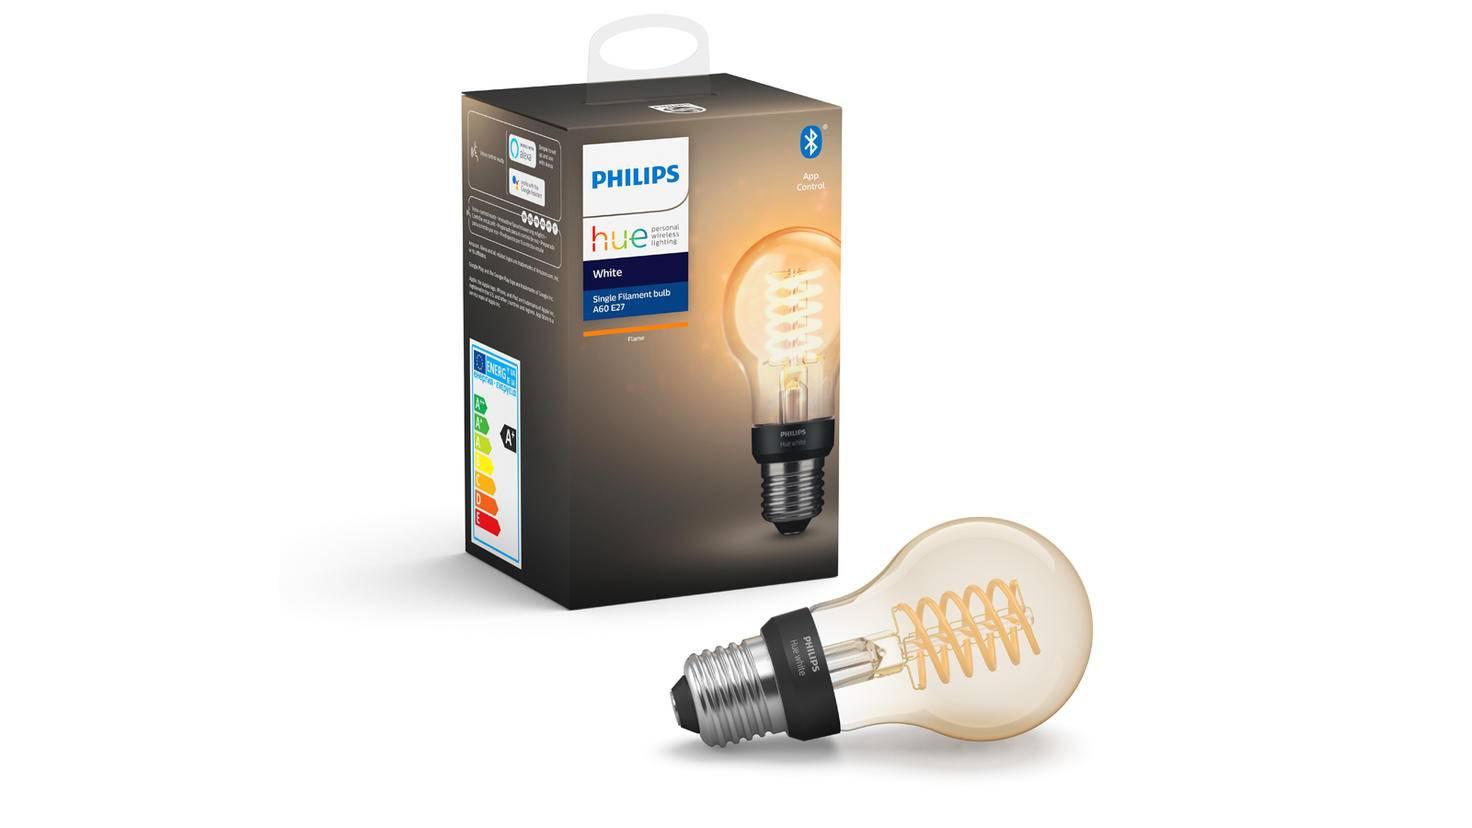 Philips hue-Filament Glühbirne-traditionelle Form-Signify